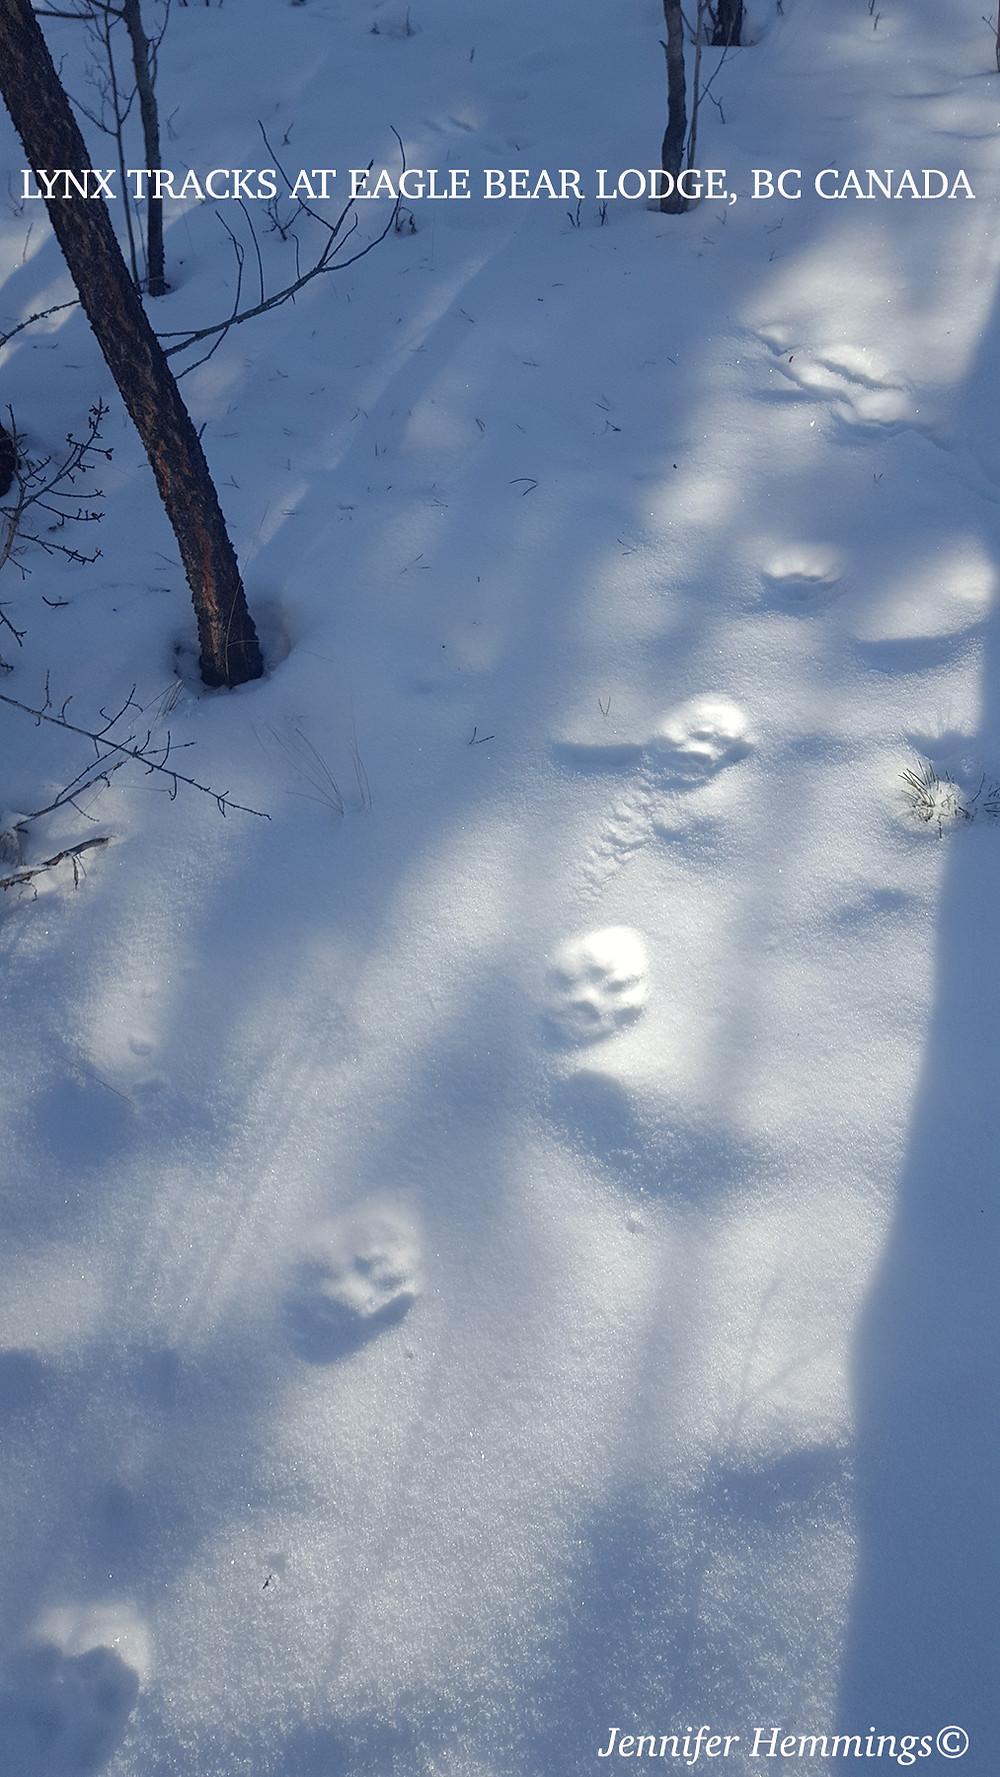 Lynx footprint